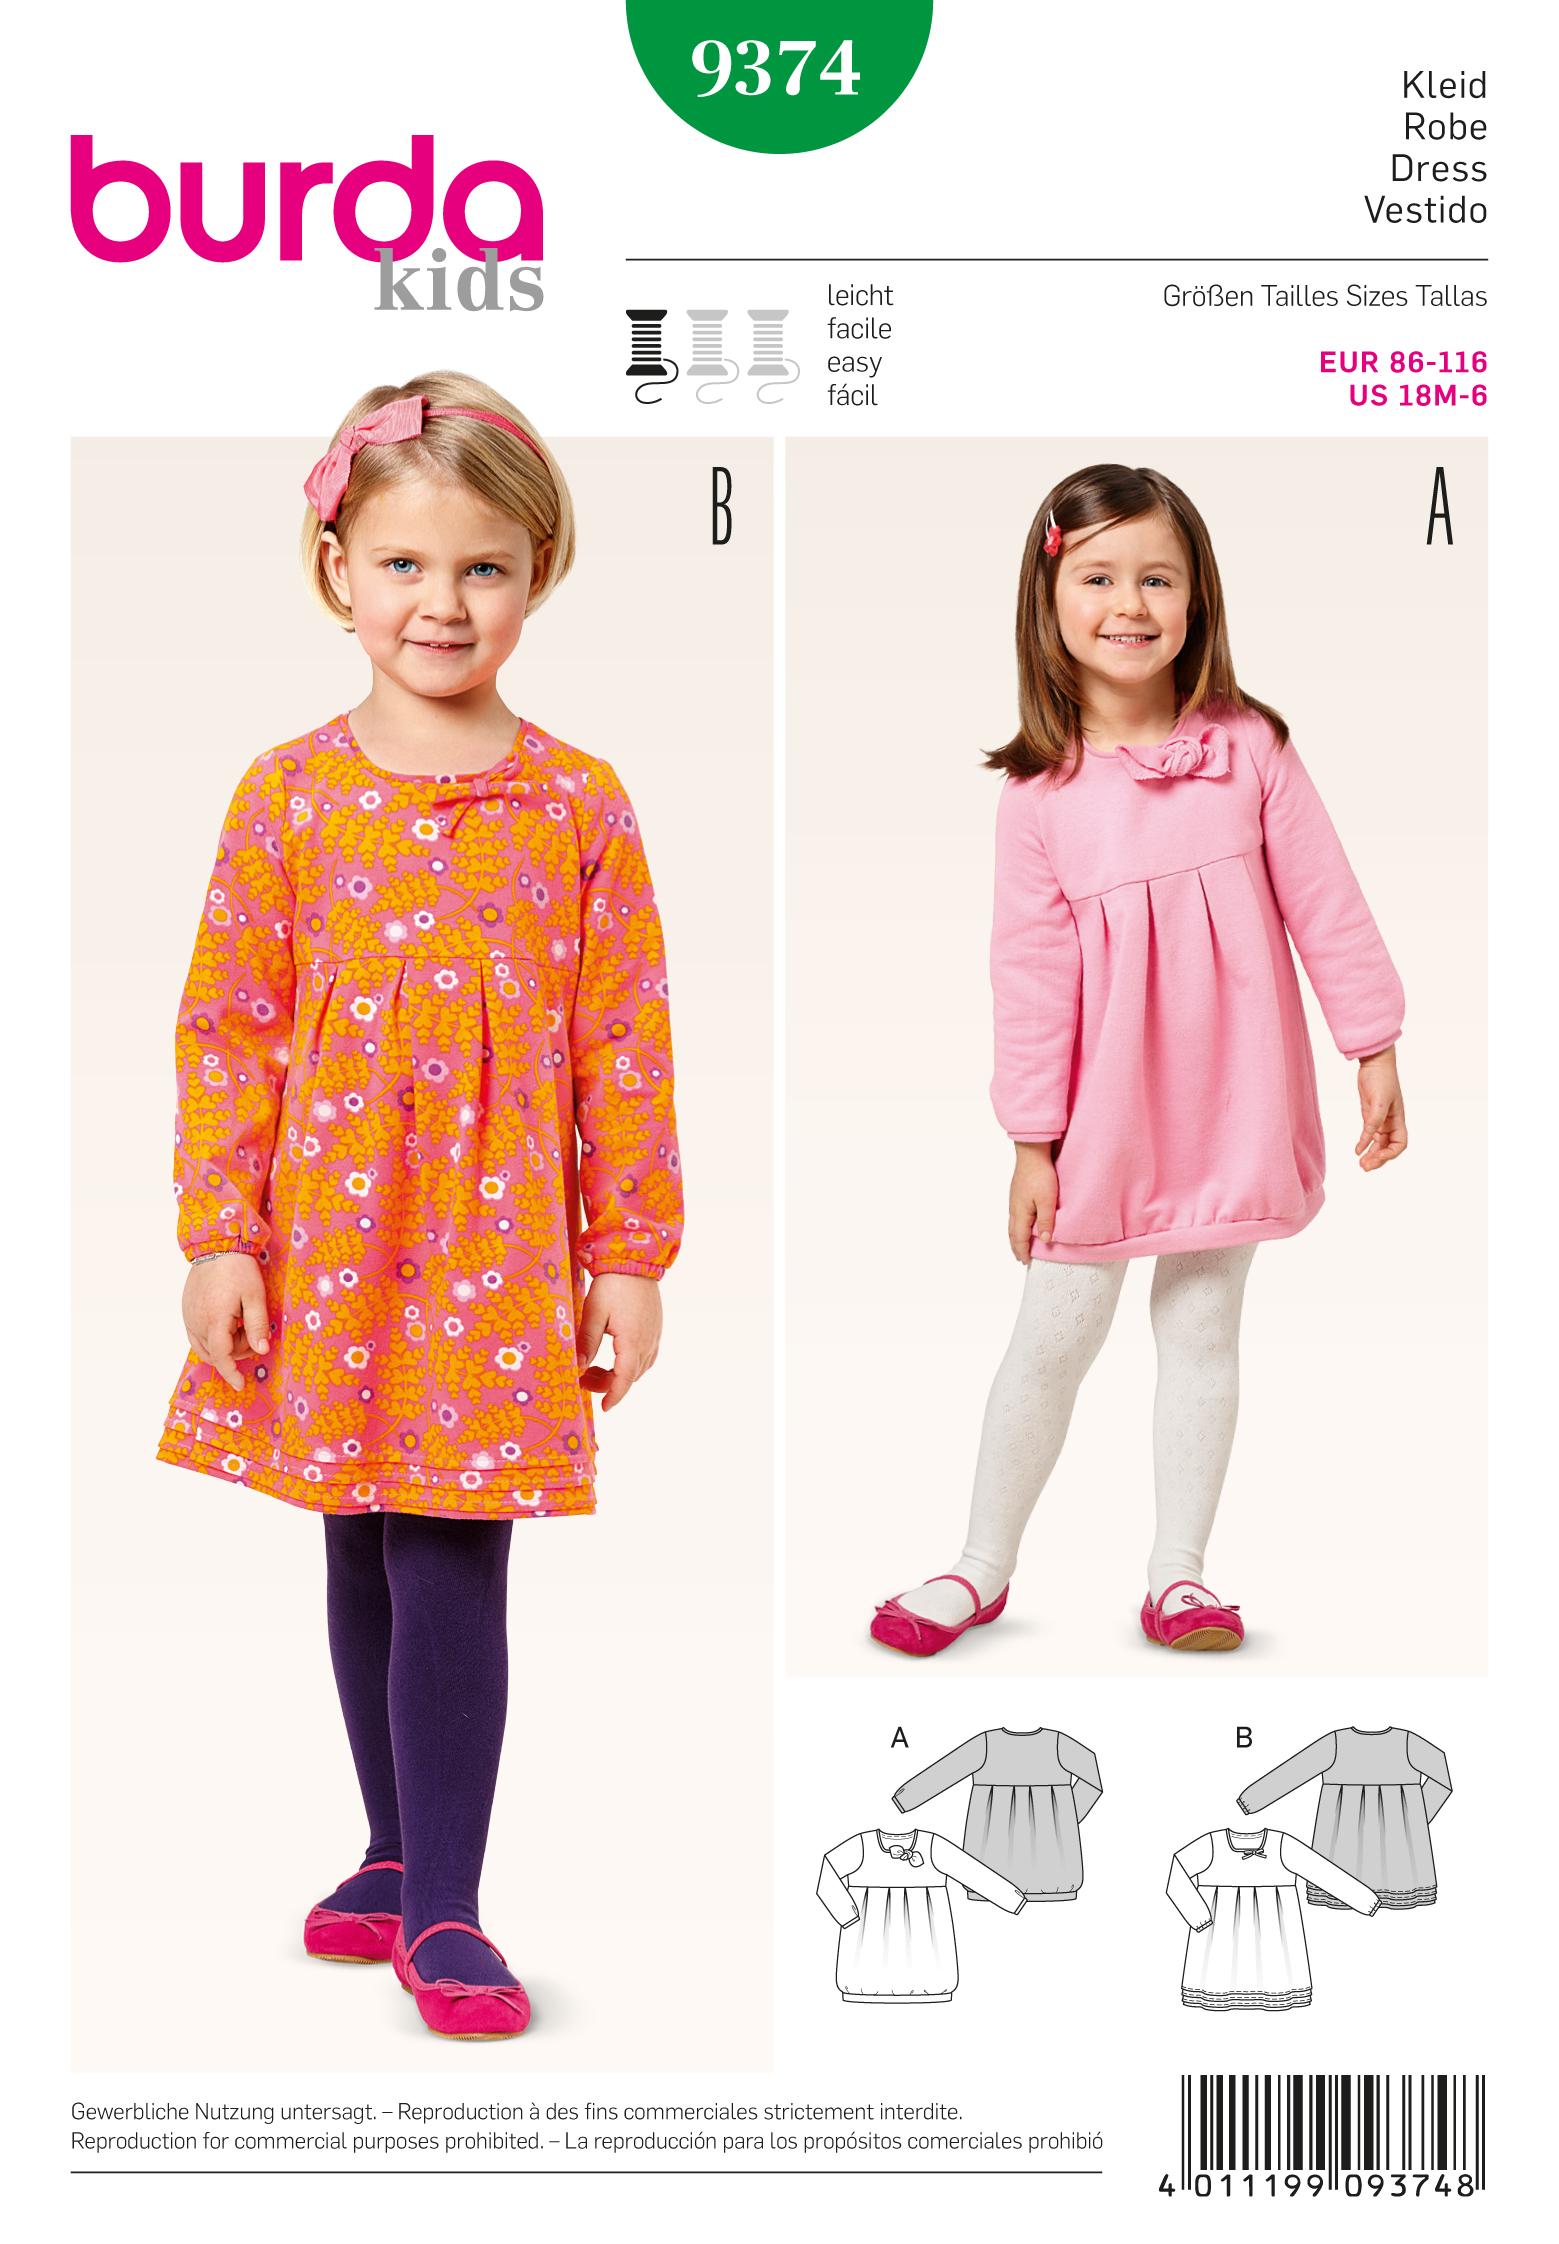 Burda 9374 Sewing Pattern